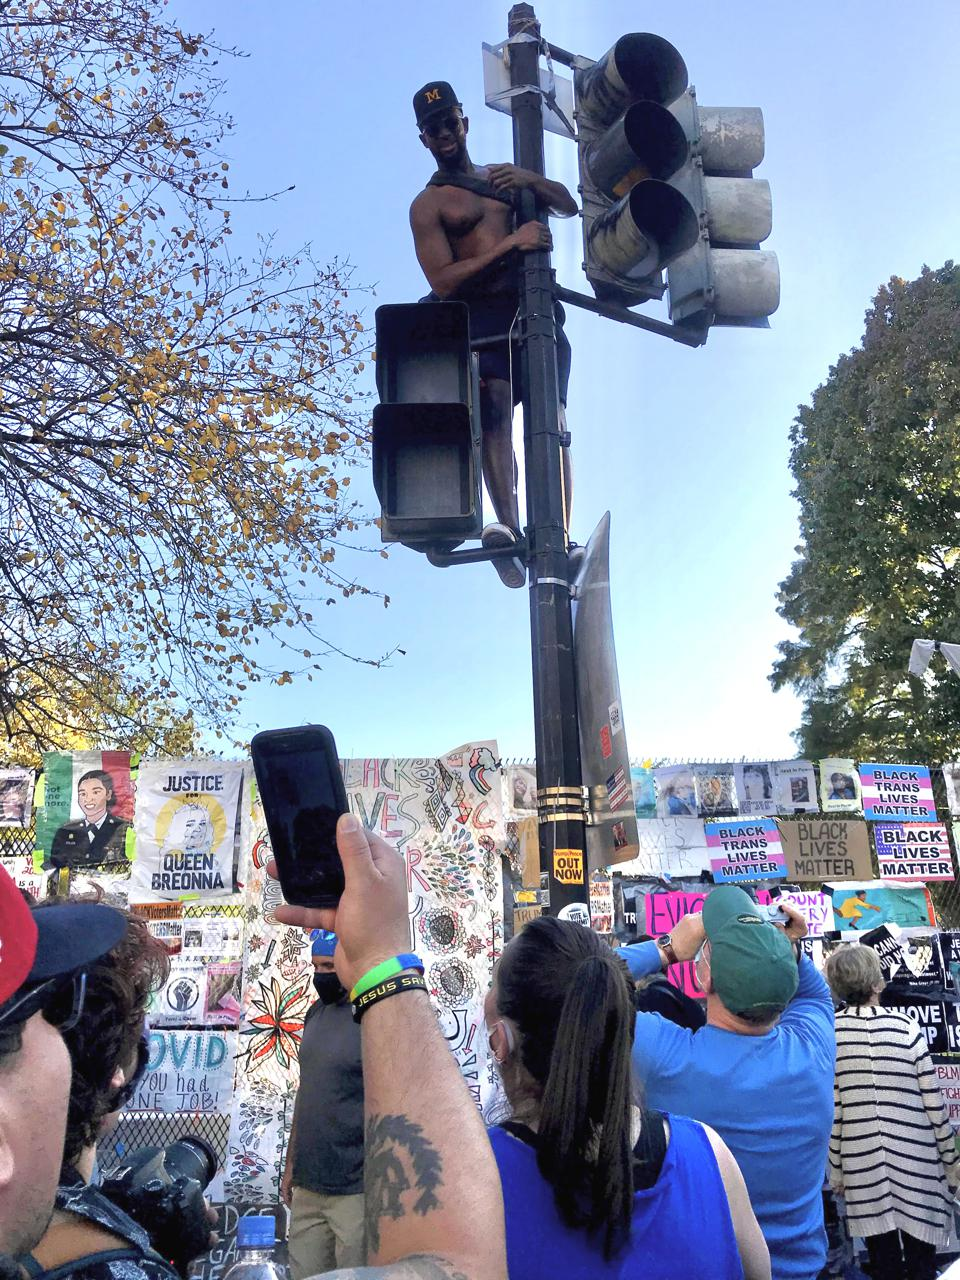 Meka celebrating in Washington, D.C. after Joe Biden had been declared winner of the election.